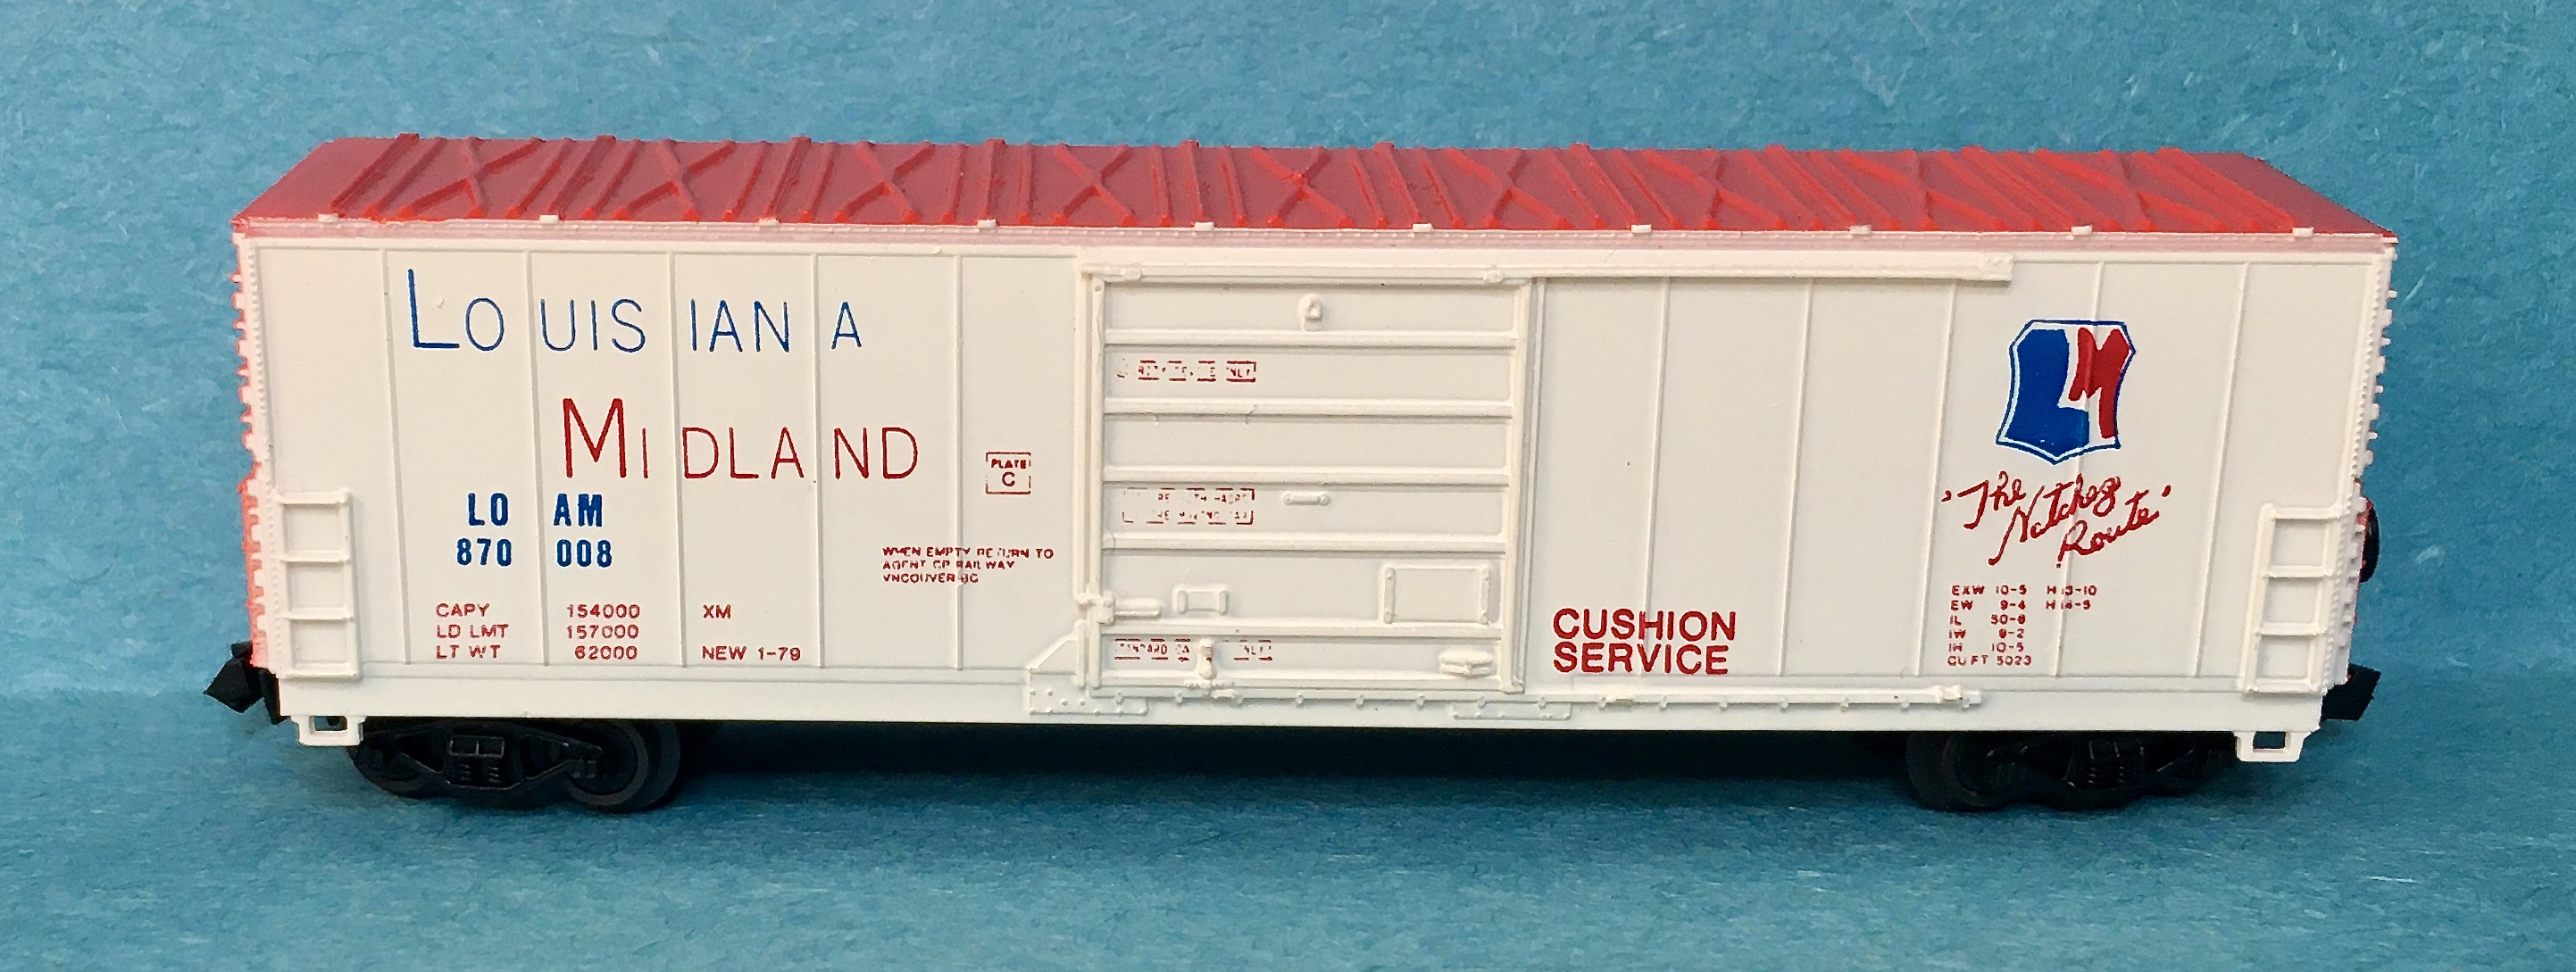 N Scale - Bev-Bel - 4469 - Boxcar, 50 Foot, Evans 5277 - Louisiana Midland - 870008